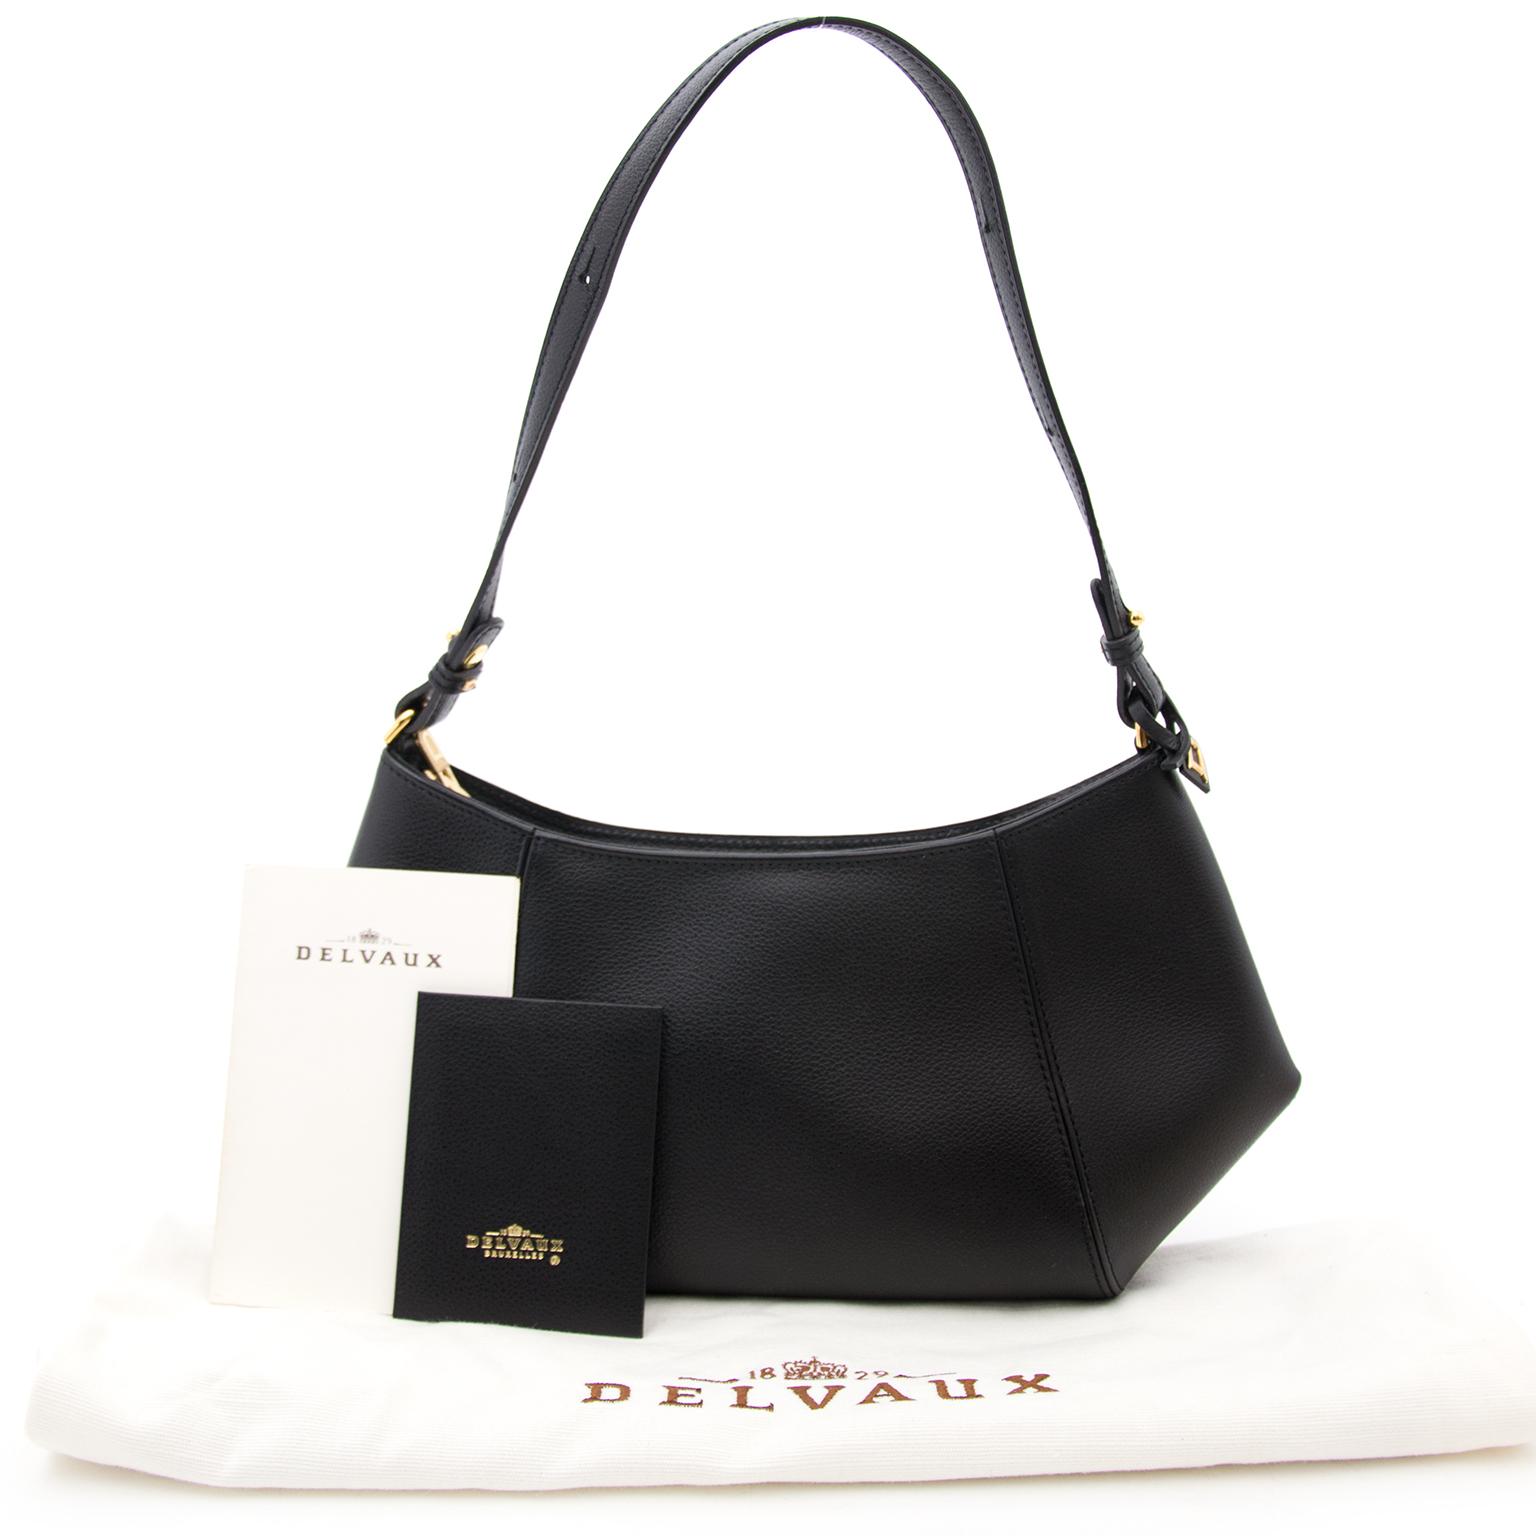 Buy authentic Delvaux bag at Labellov.com